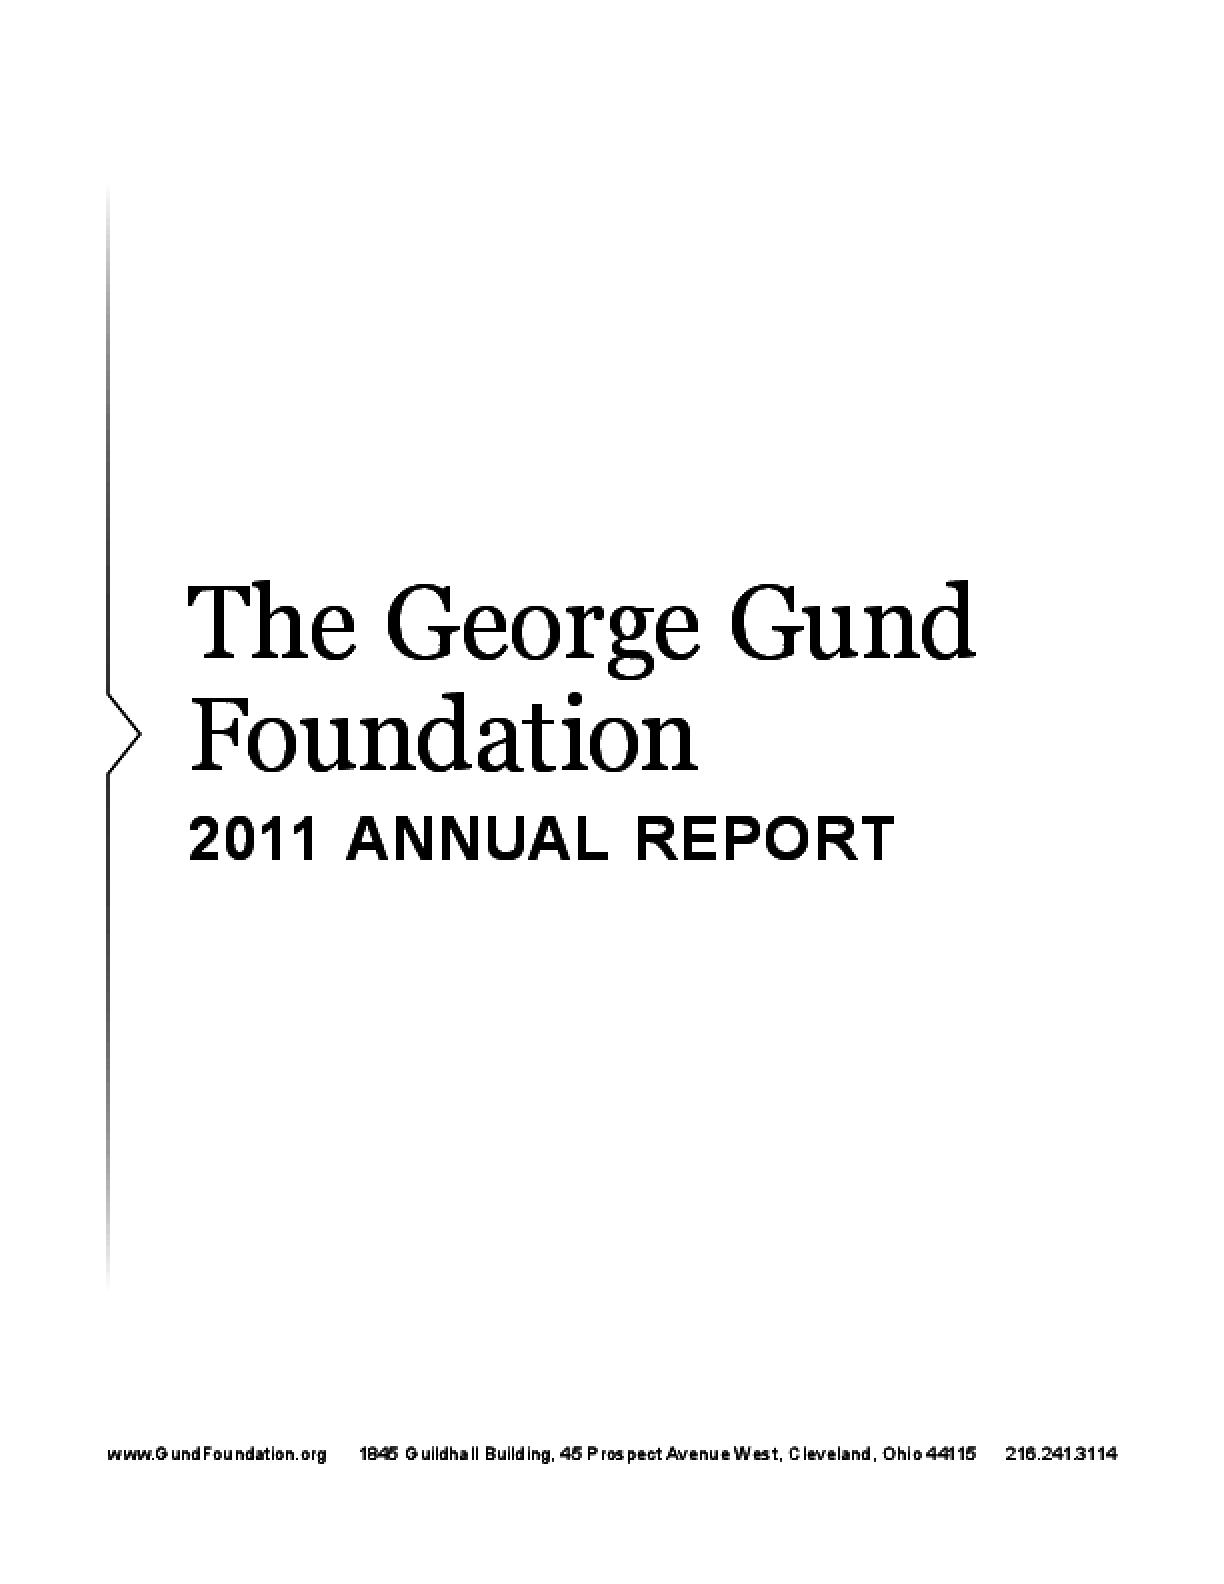 George Gund Foundation 2011 Annual Report